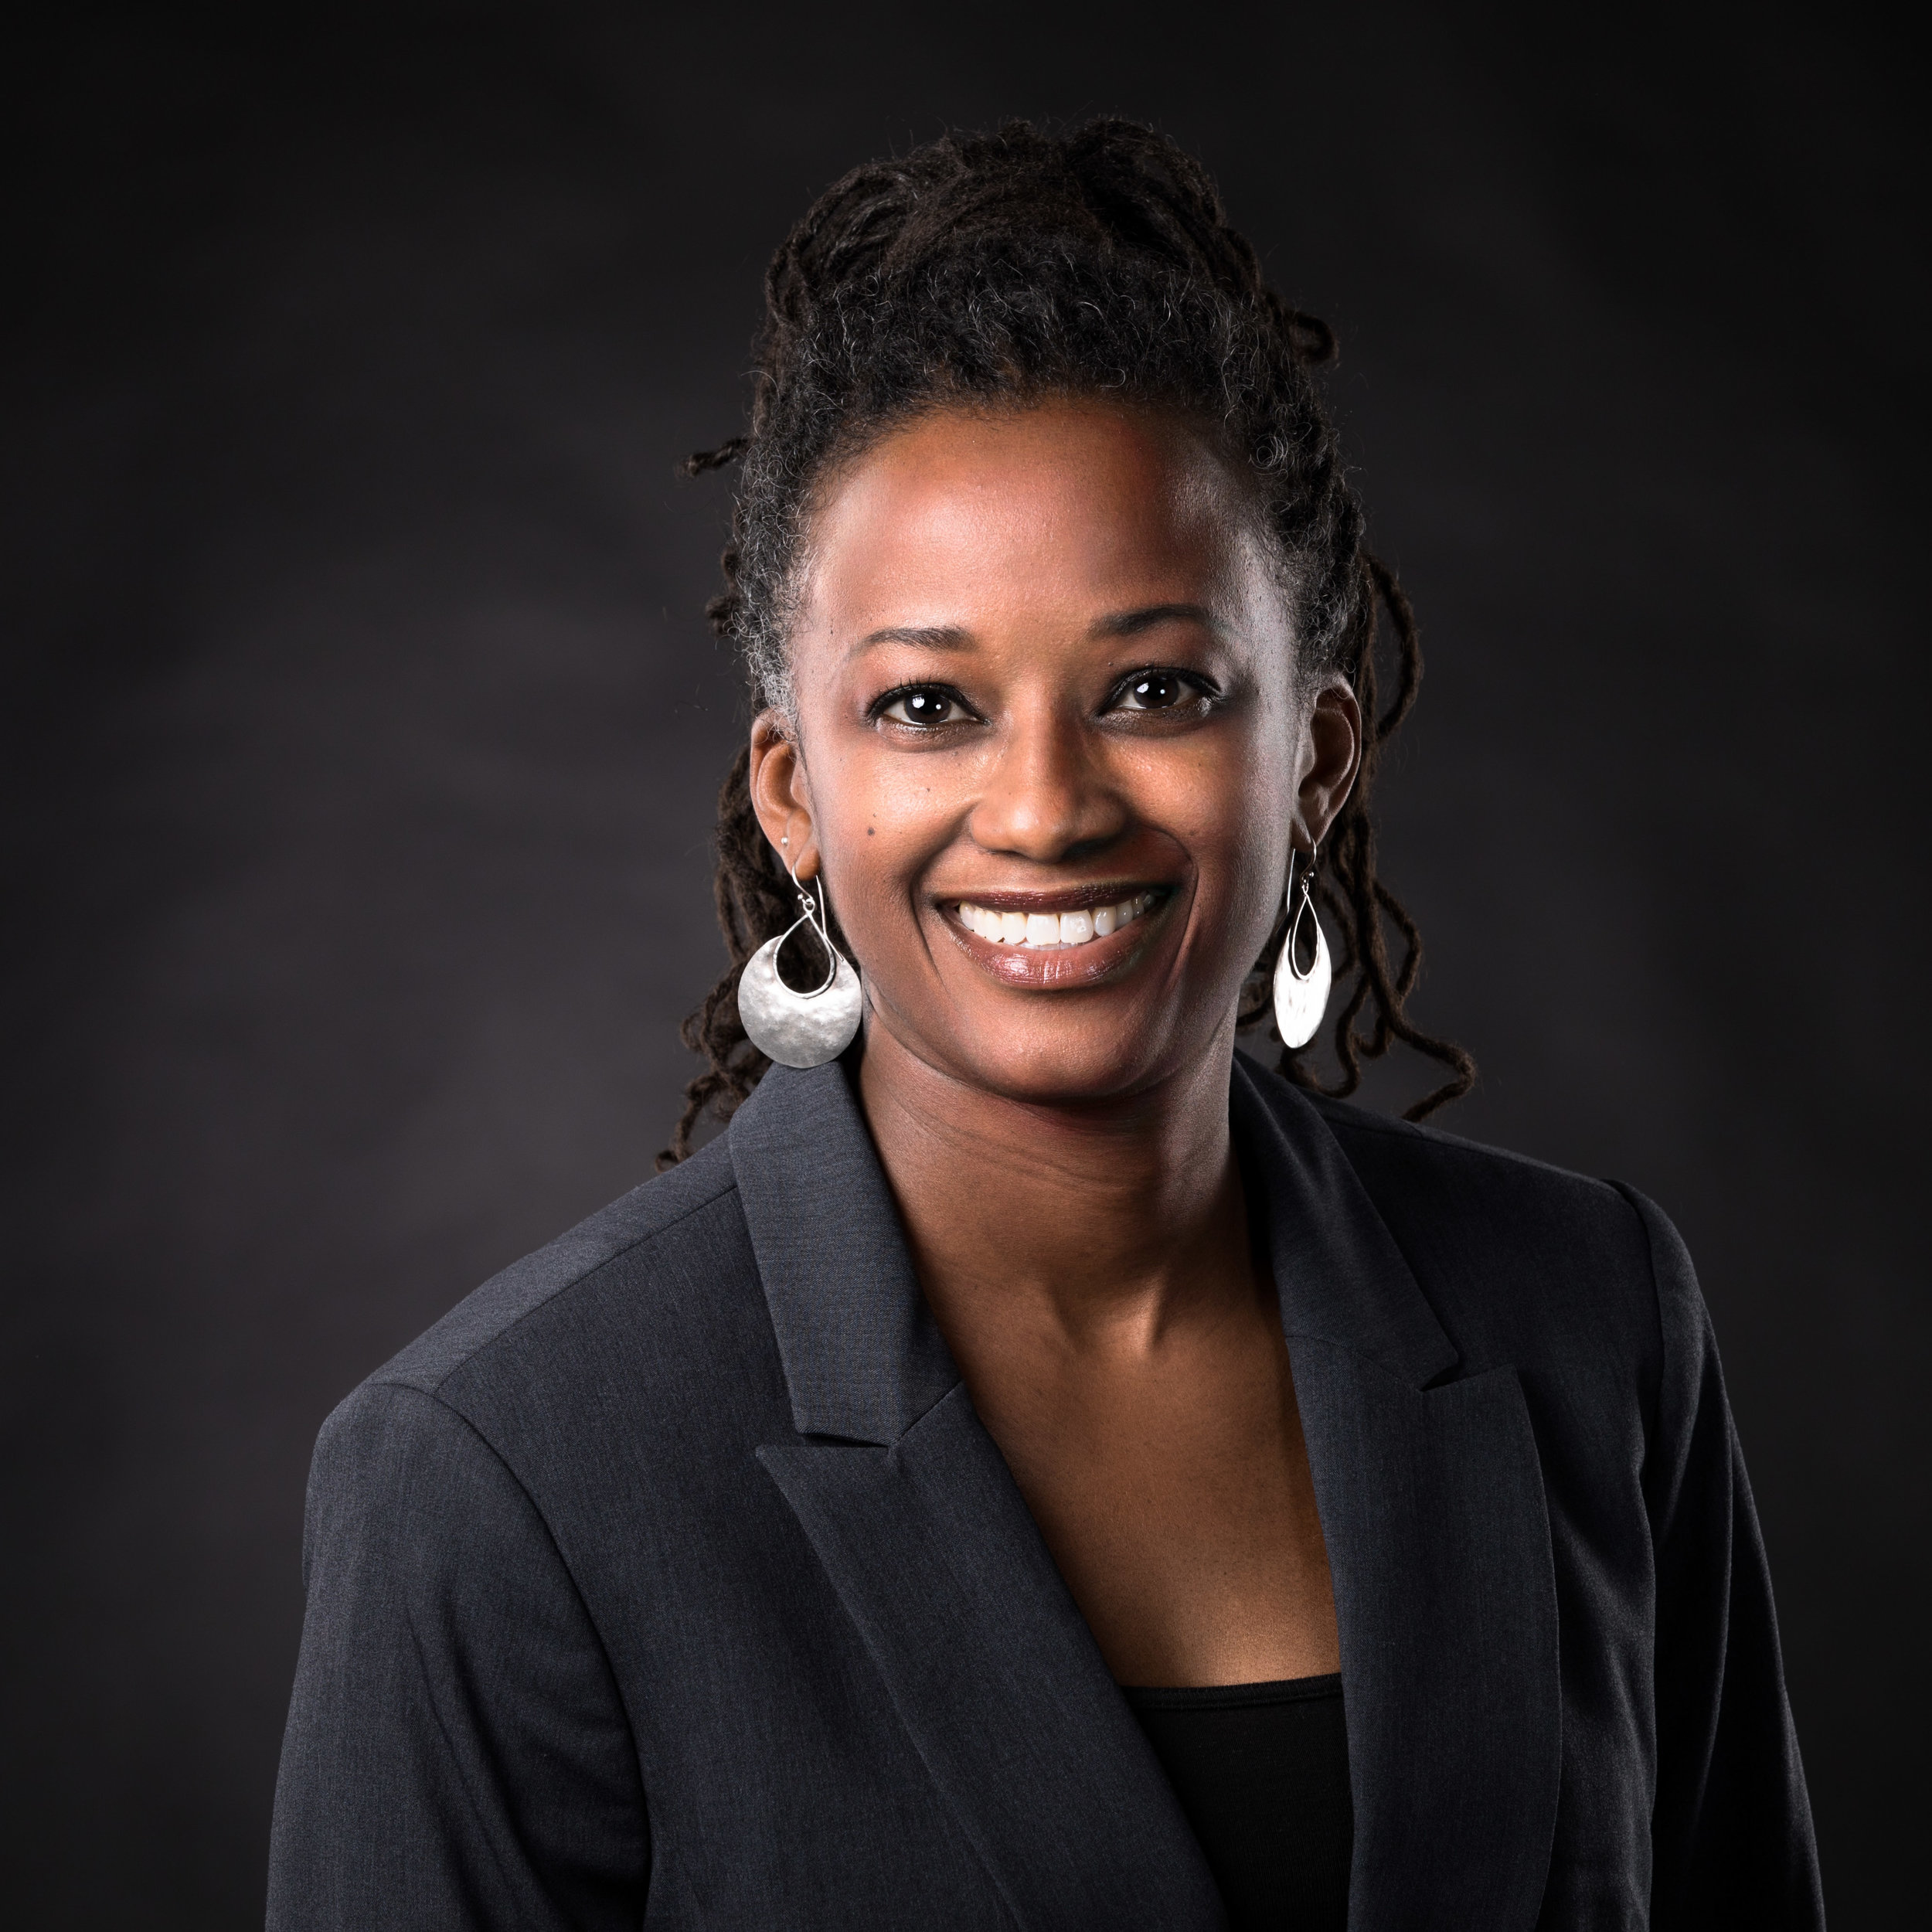 Founder, Kimberly Archibald Russell, MBA, Advanced Teacher of Yoga Therapy, E-RYT 500, CKYT 200, YACEP  (Dale McDonald Photography)